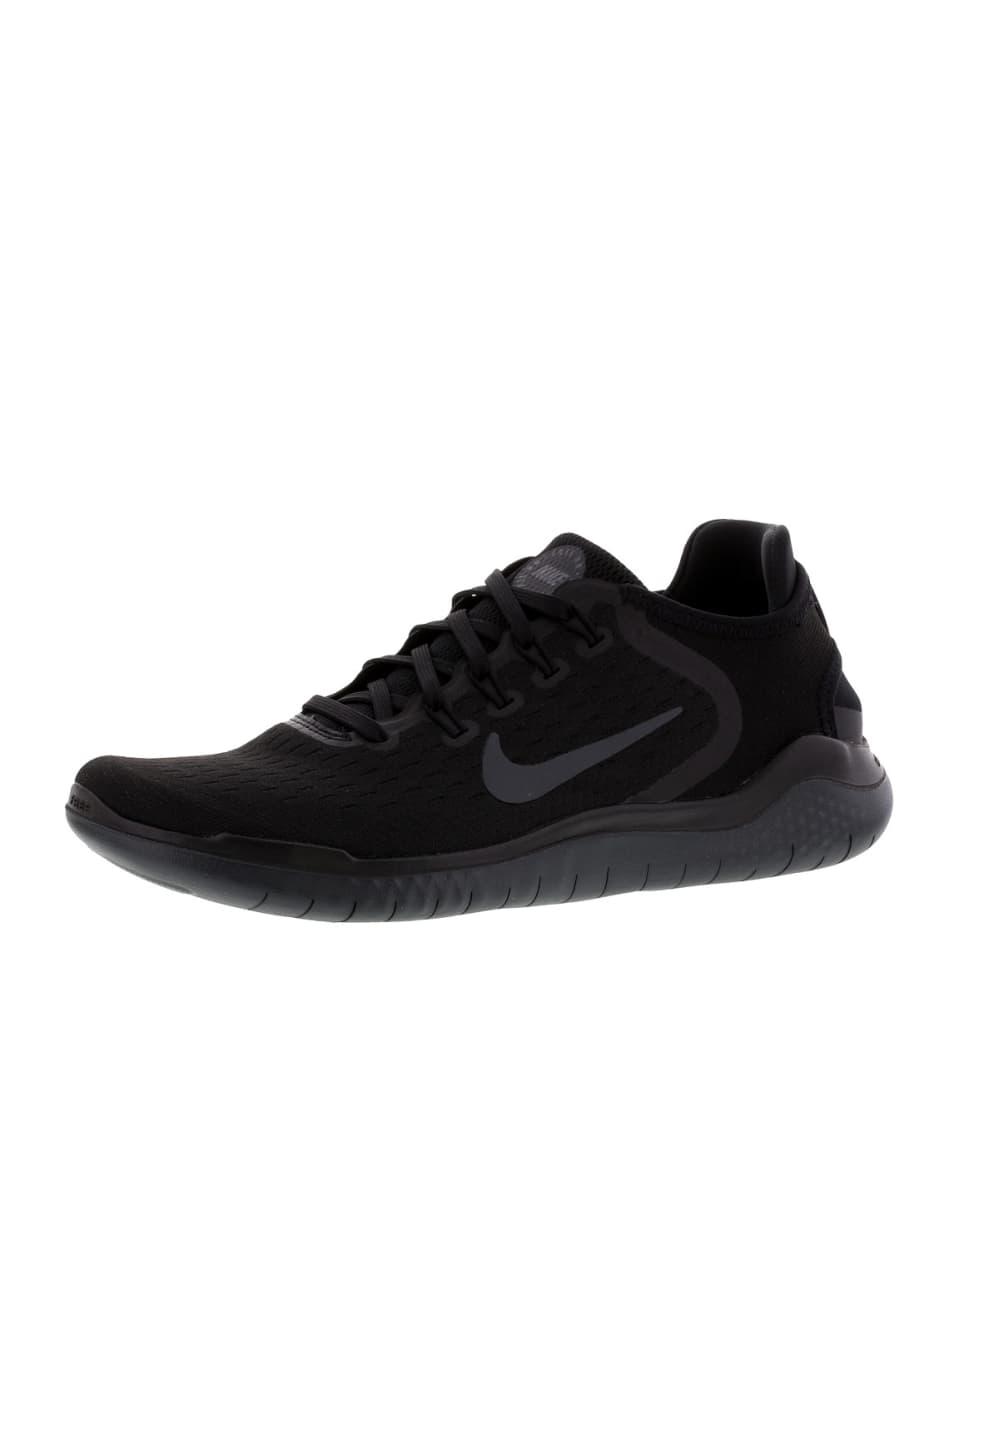 Rn Nike Free Mujer Negro Para De Running 2018 Zapatillas